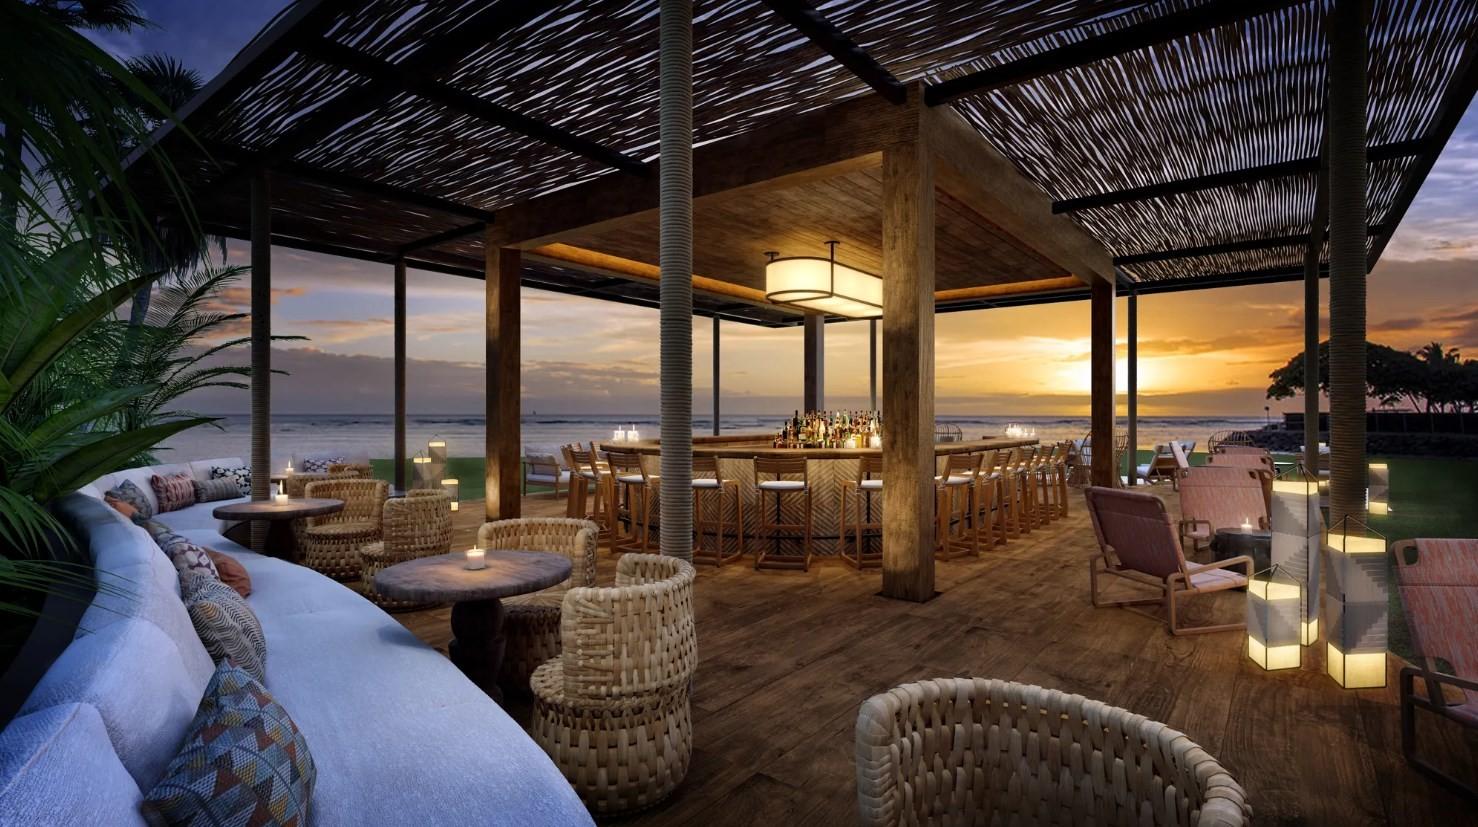 news-main-auberge-resorts-collection-opens-mauna-lani-resort-in-hawaii.1579258590